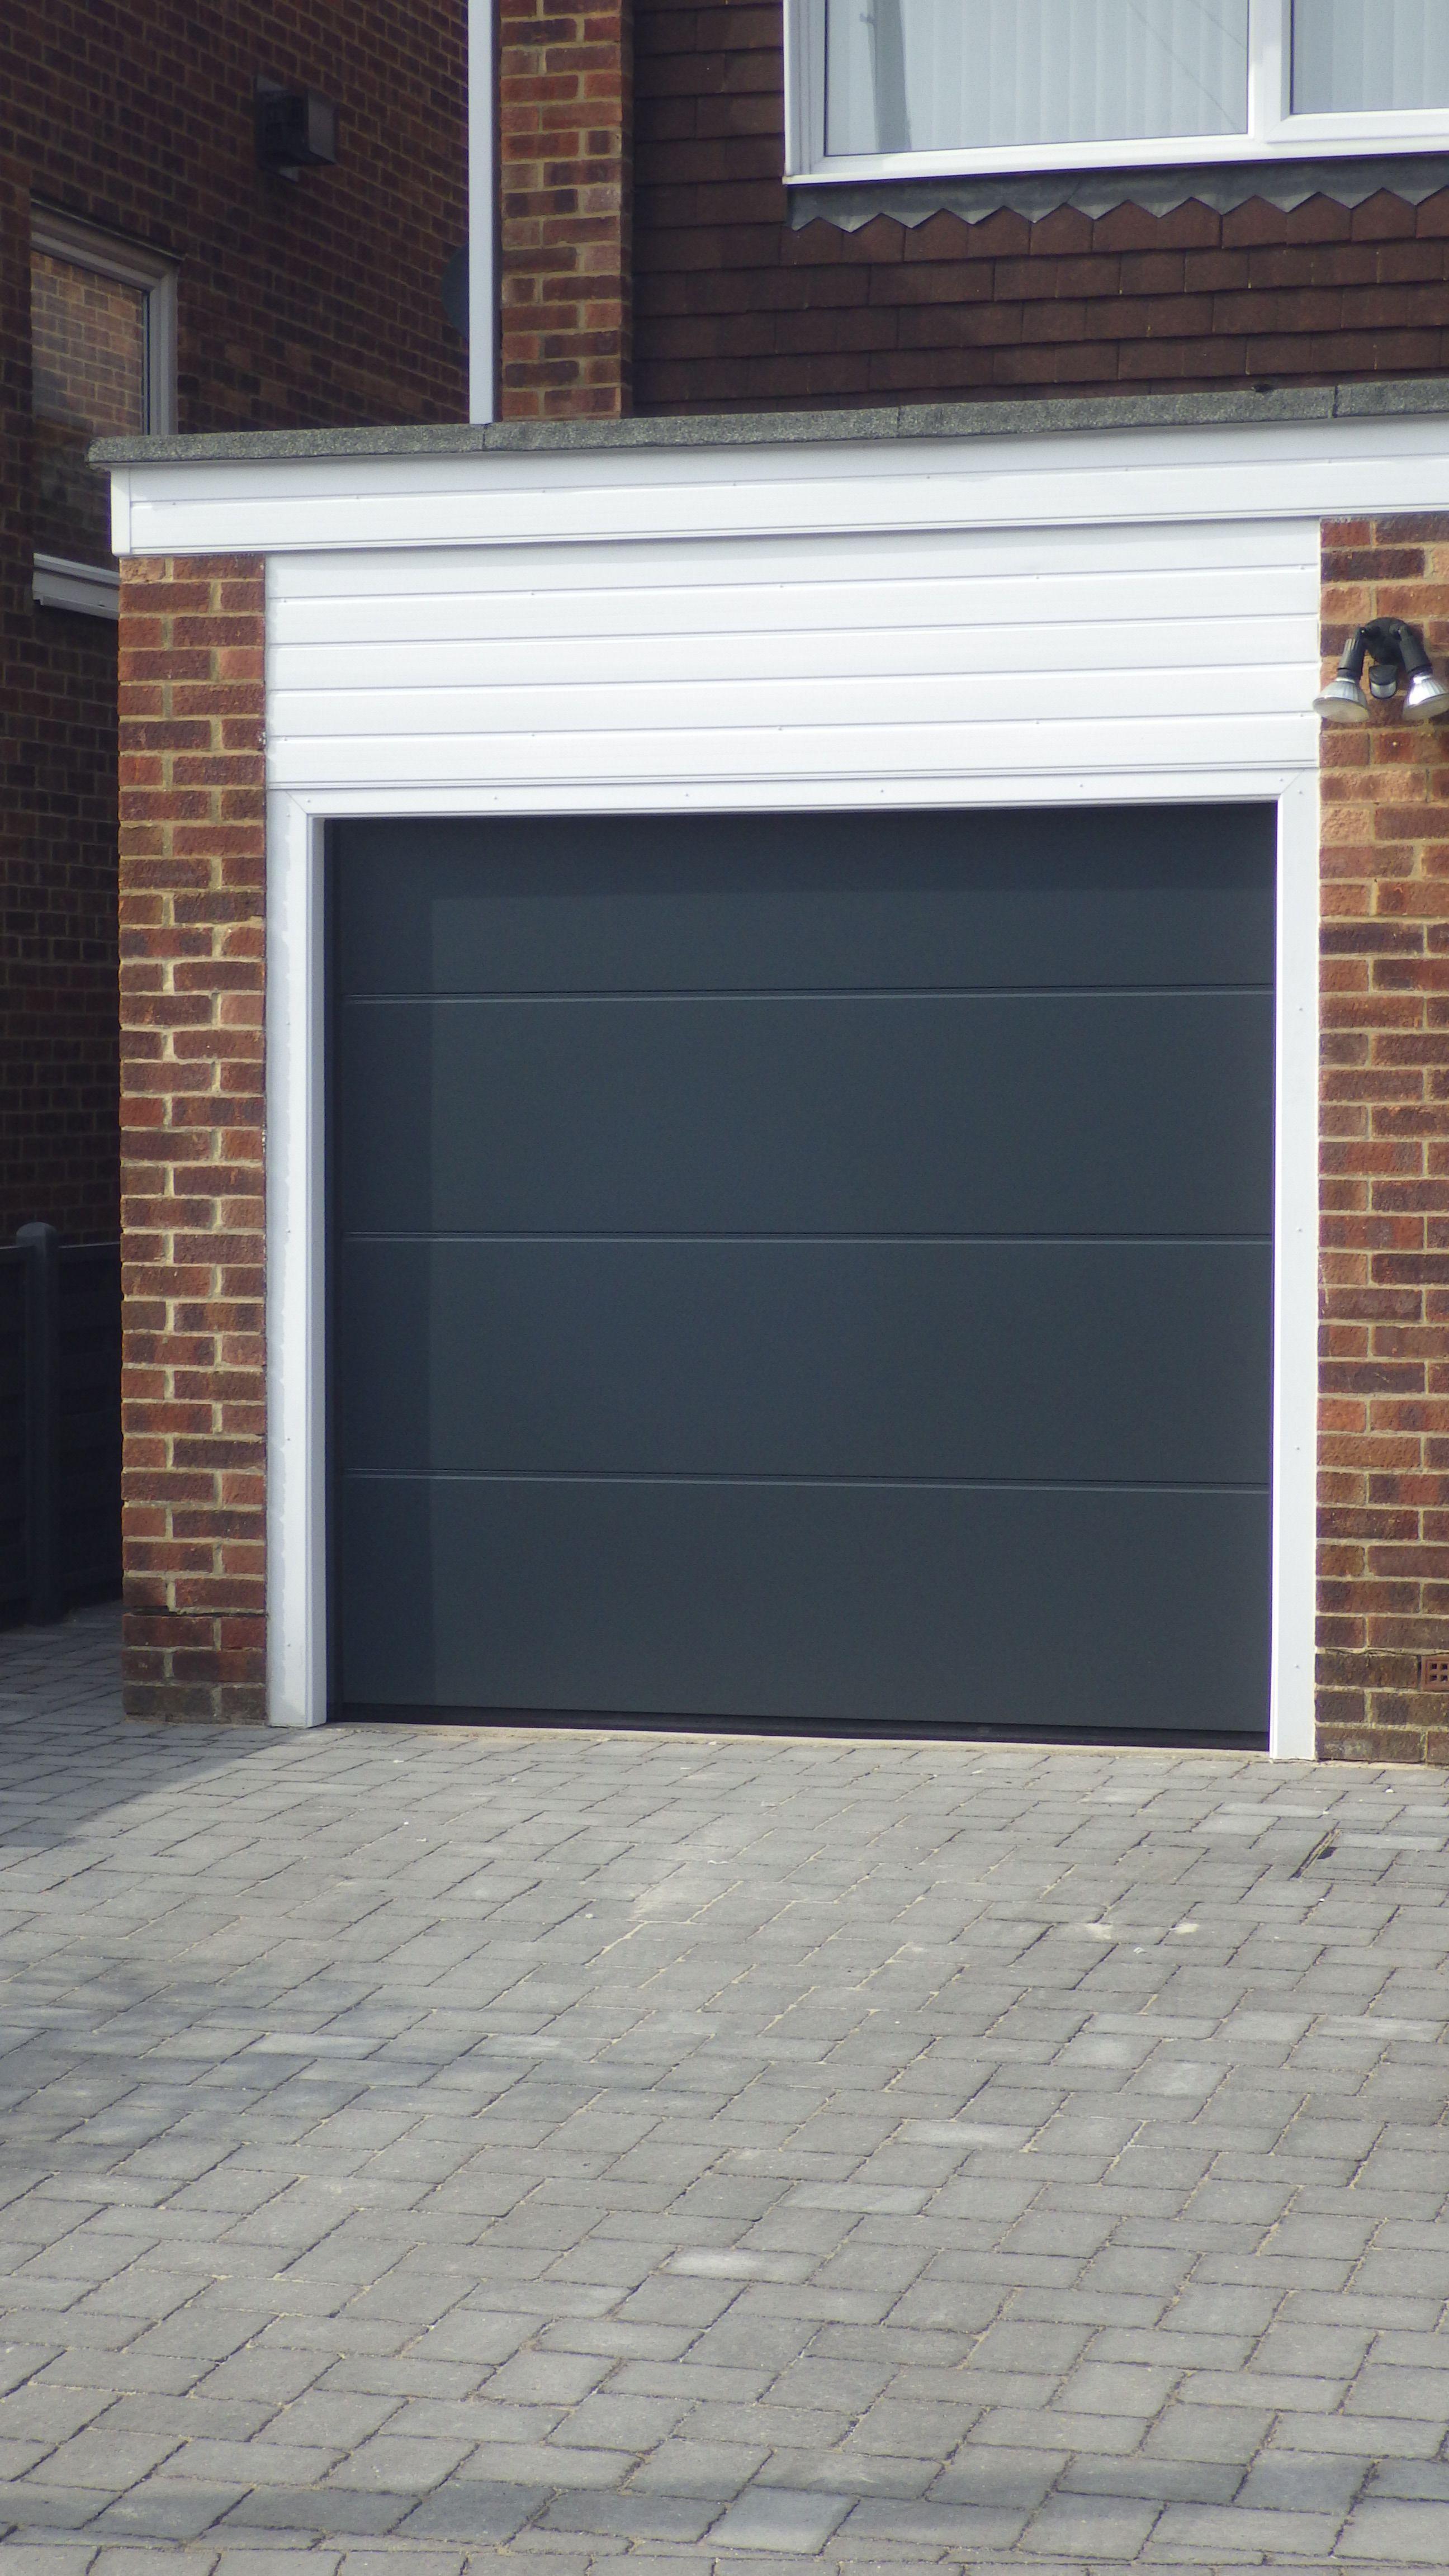 Hormann sectional l ribbed garage door in anthracite grey hormann sectional l ribbed garage door in anthracite grey rubansaba